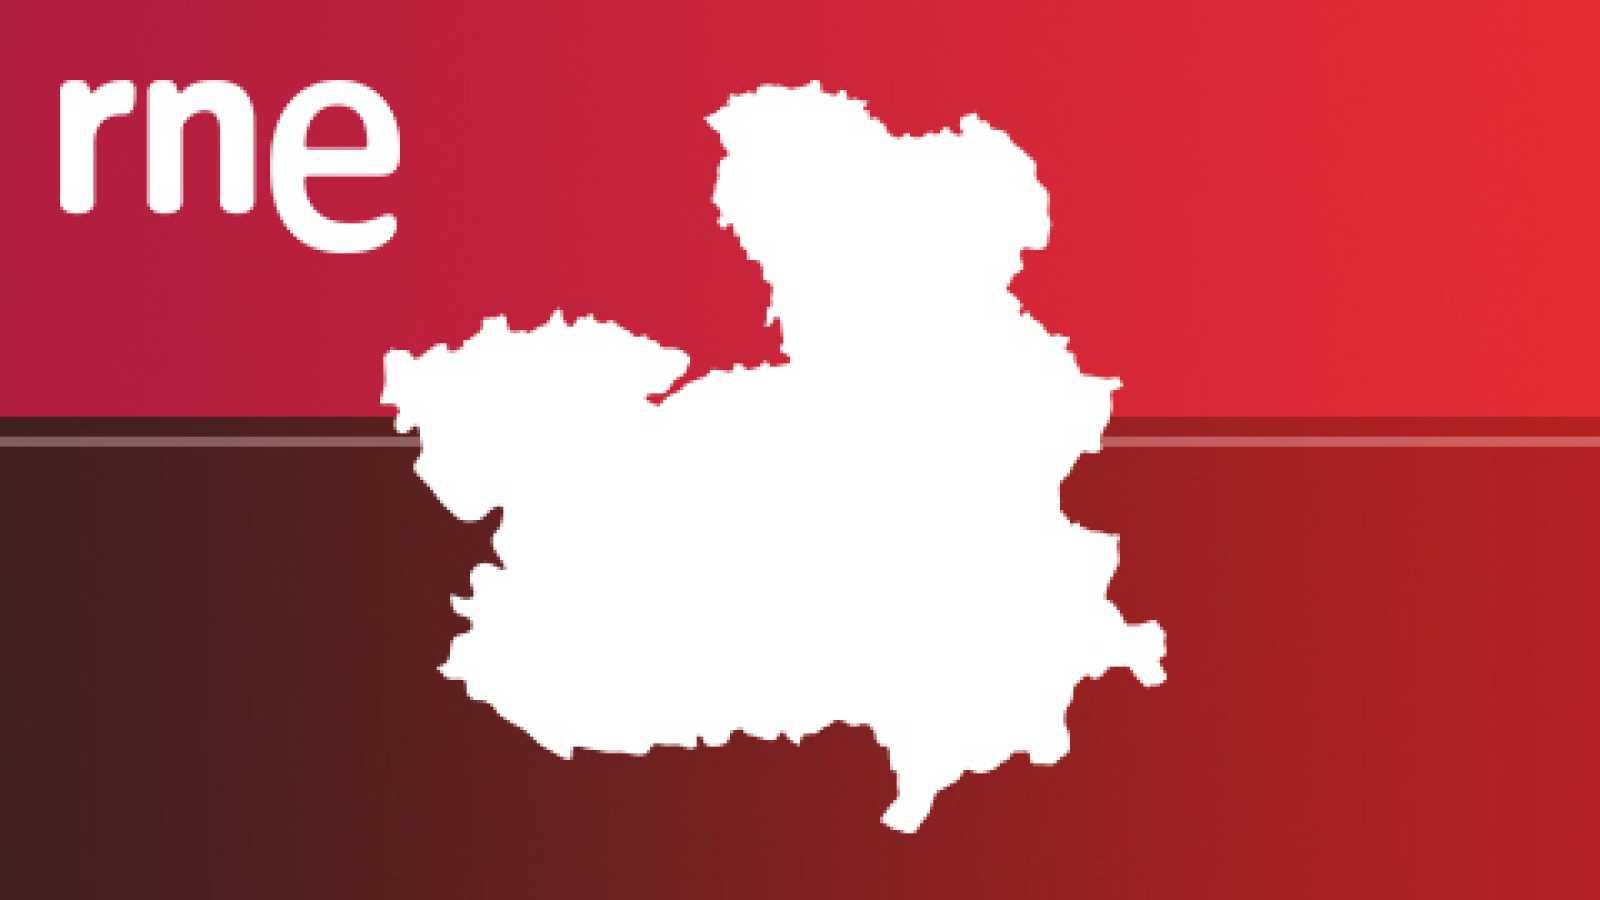 Crónica de Castilla-La Mancha 28/09/2020 - Escuchar ahora